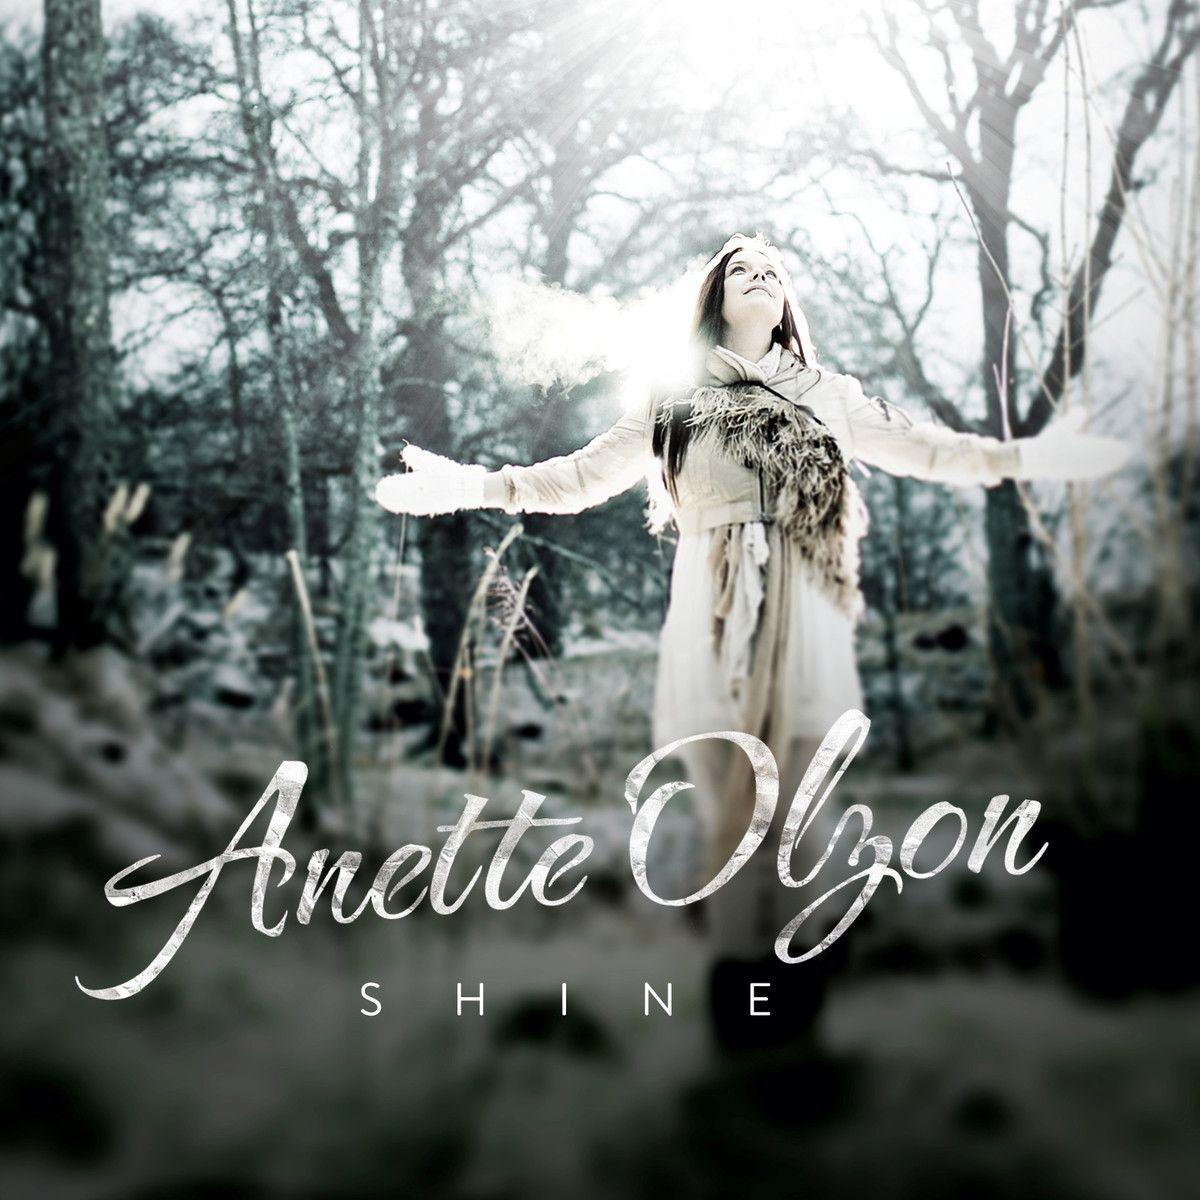 Anette Olzon - Shine album cover